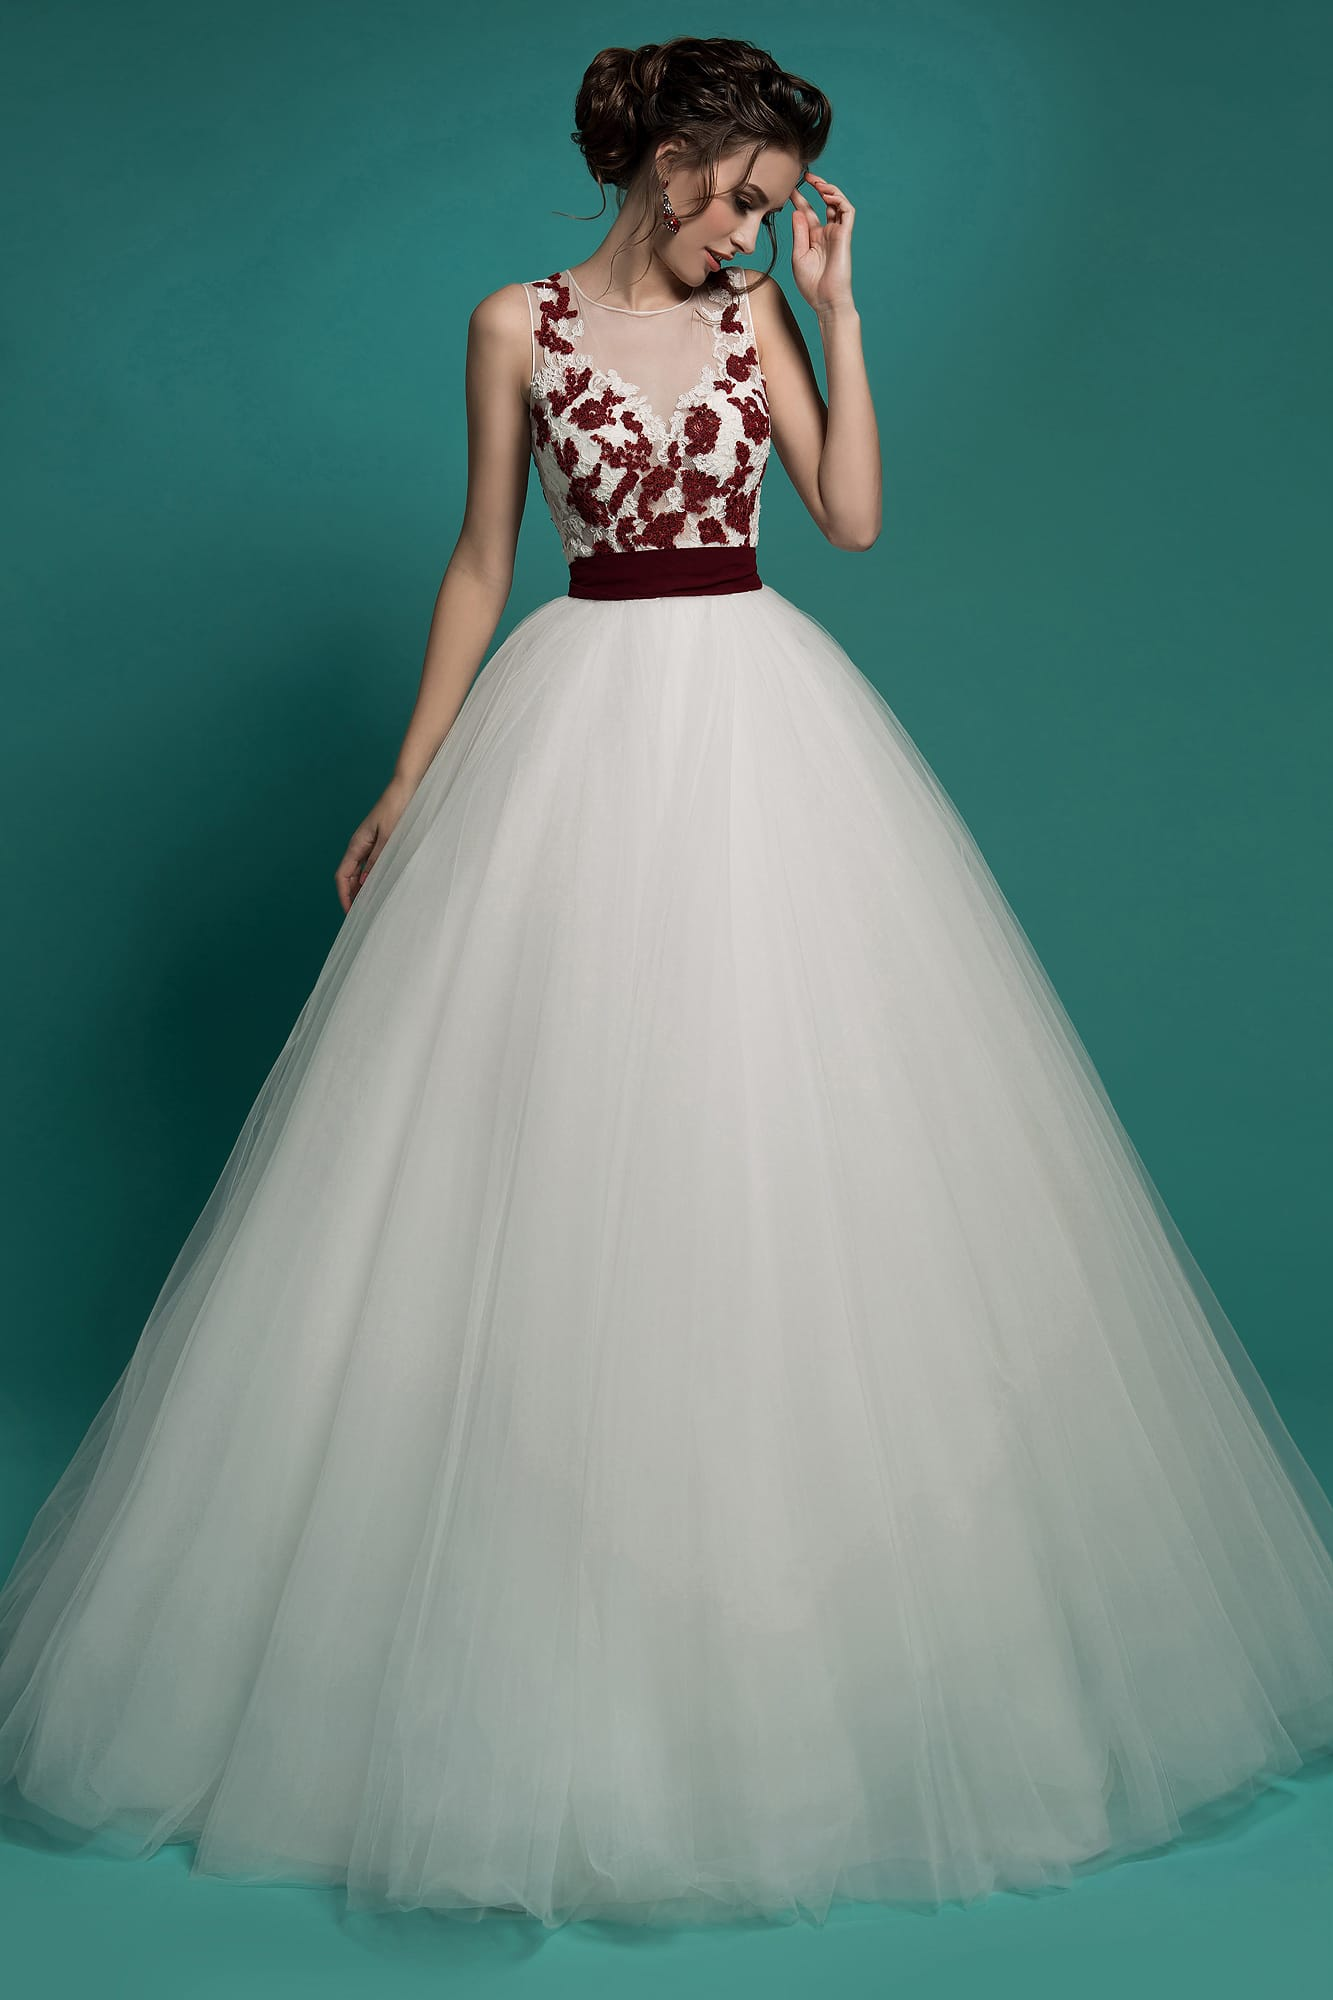 f7dd129fd95 Свадебное платье Gabbiano Ella. Купить свадебное платье в салоне ...